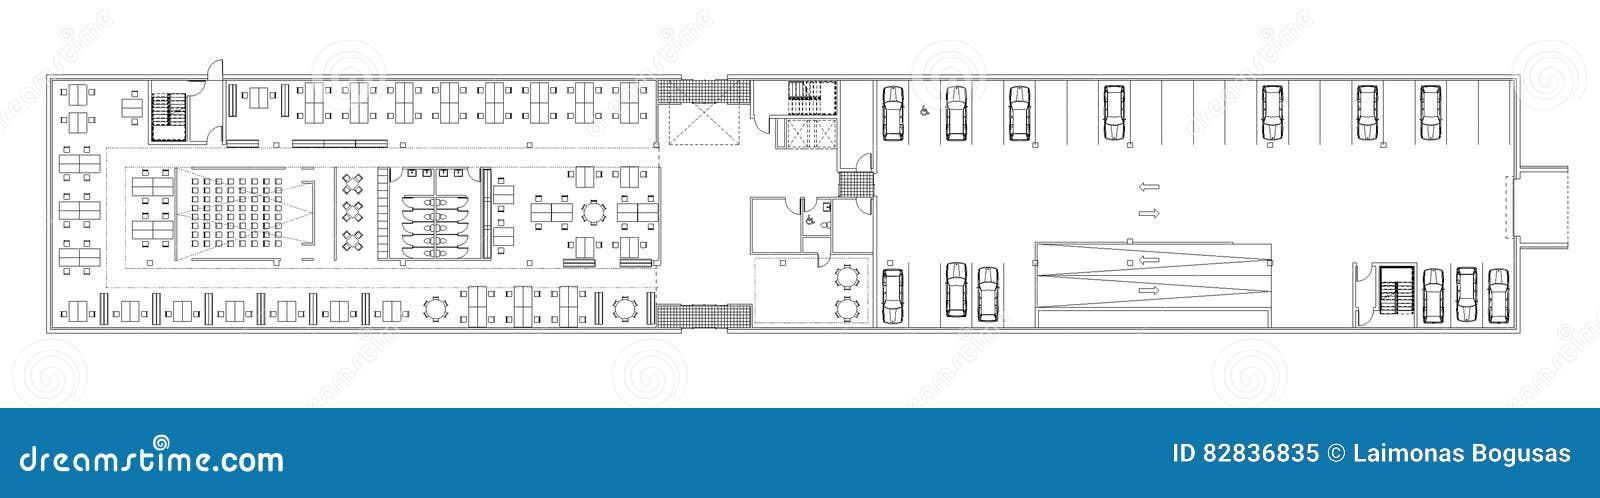 Floor Plan Of The Office Building Stock Illustration Illustration Of Architecture Architectural 82836835